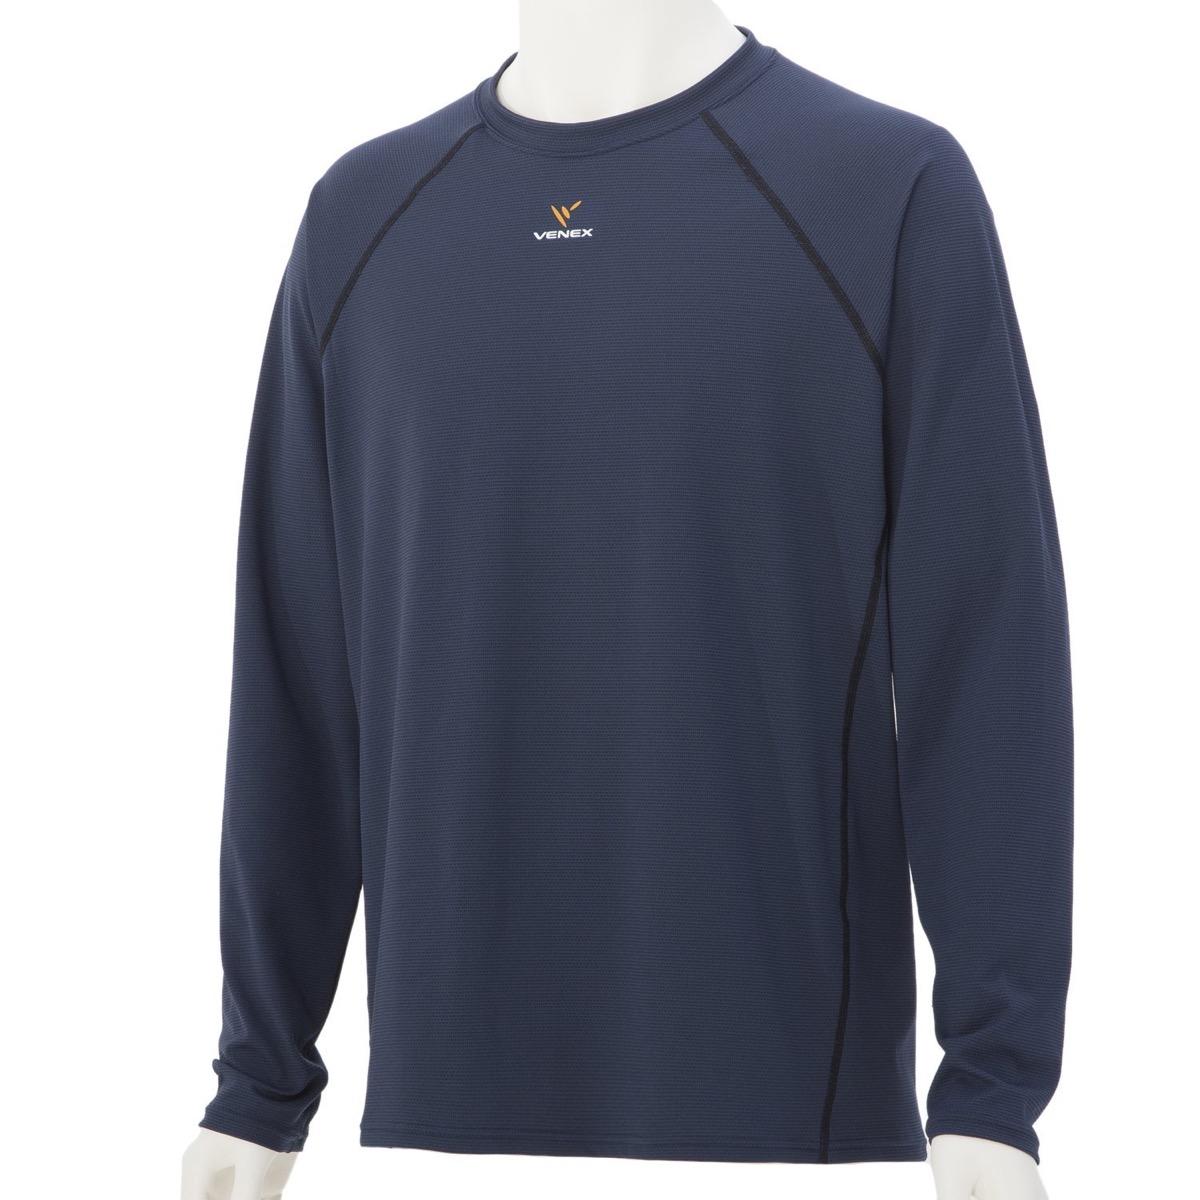 VENEX ( ベネクス ) リカバリーウェア リラックス ロングスリーブ メンズ スポーツウェア (XL, ネイビー)